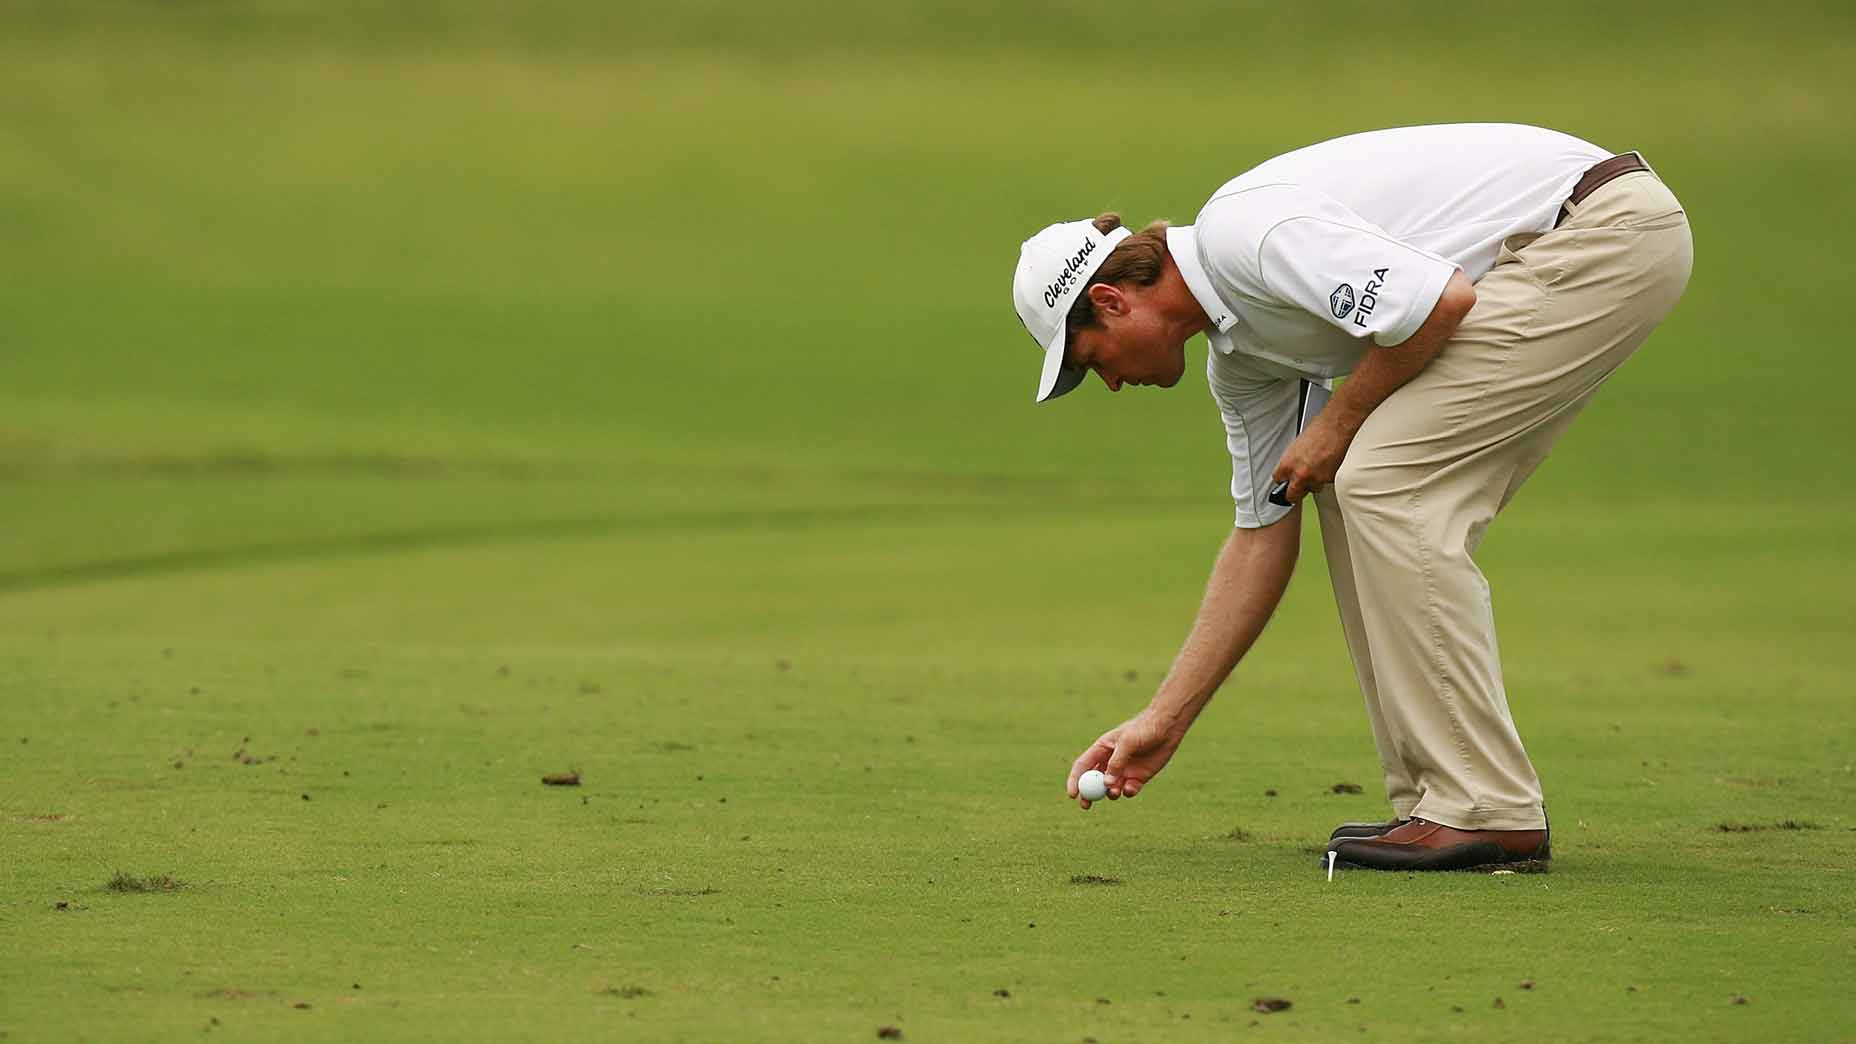 Golfer replacing ball in fairway